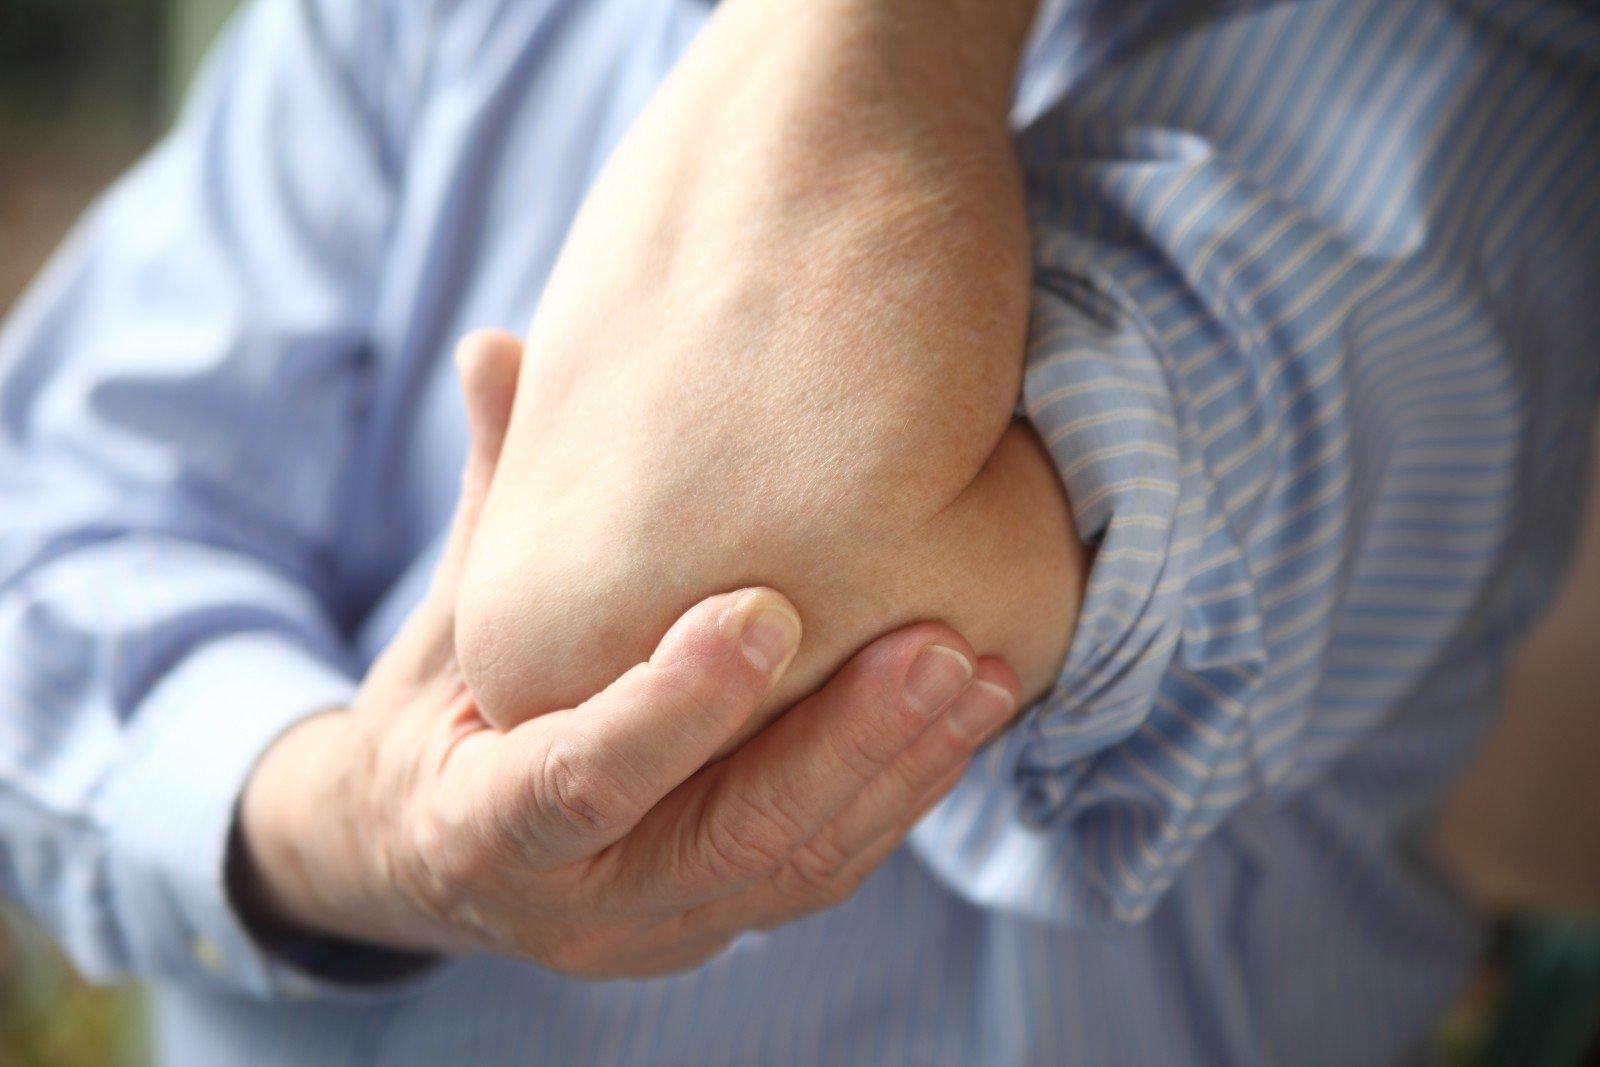 Комплексная терапия при суставной боли актерма лекарство от суставов